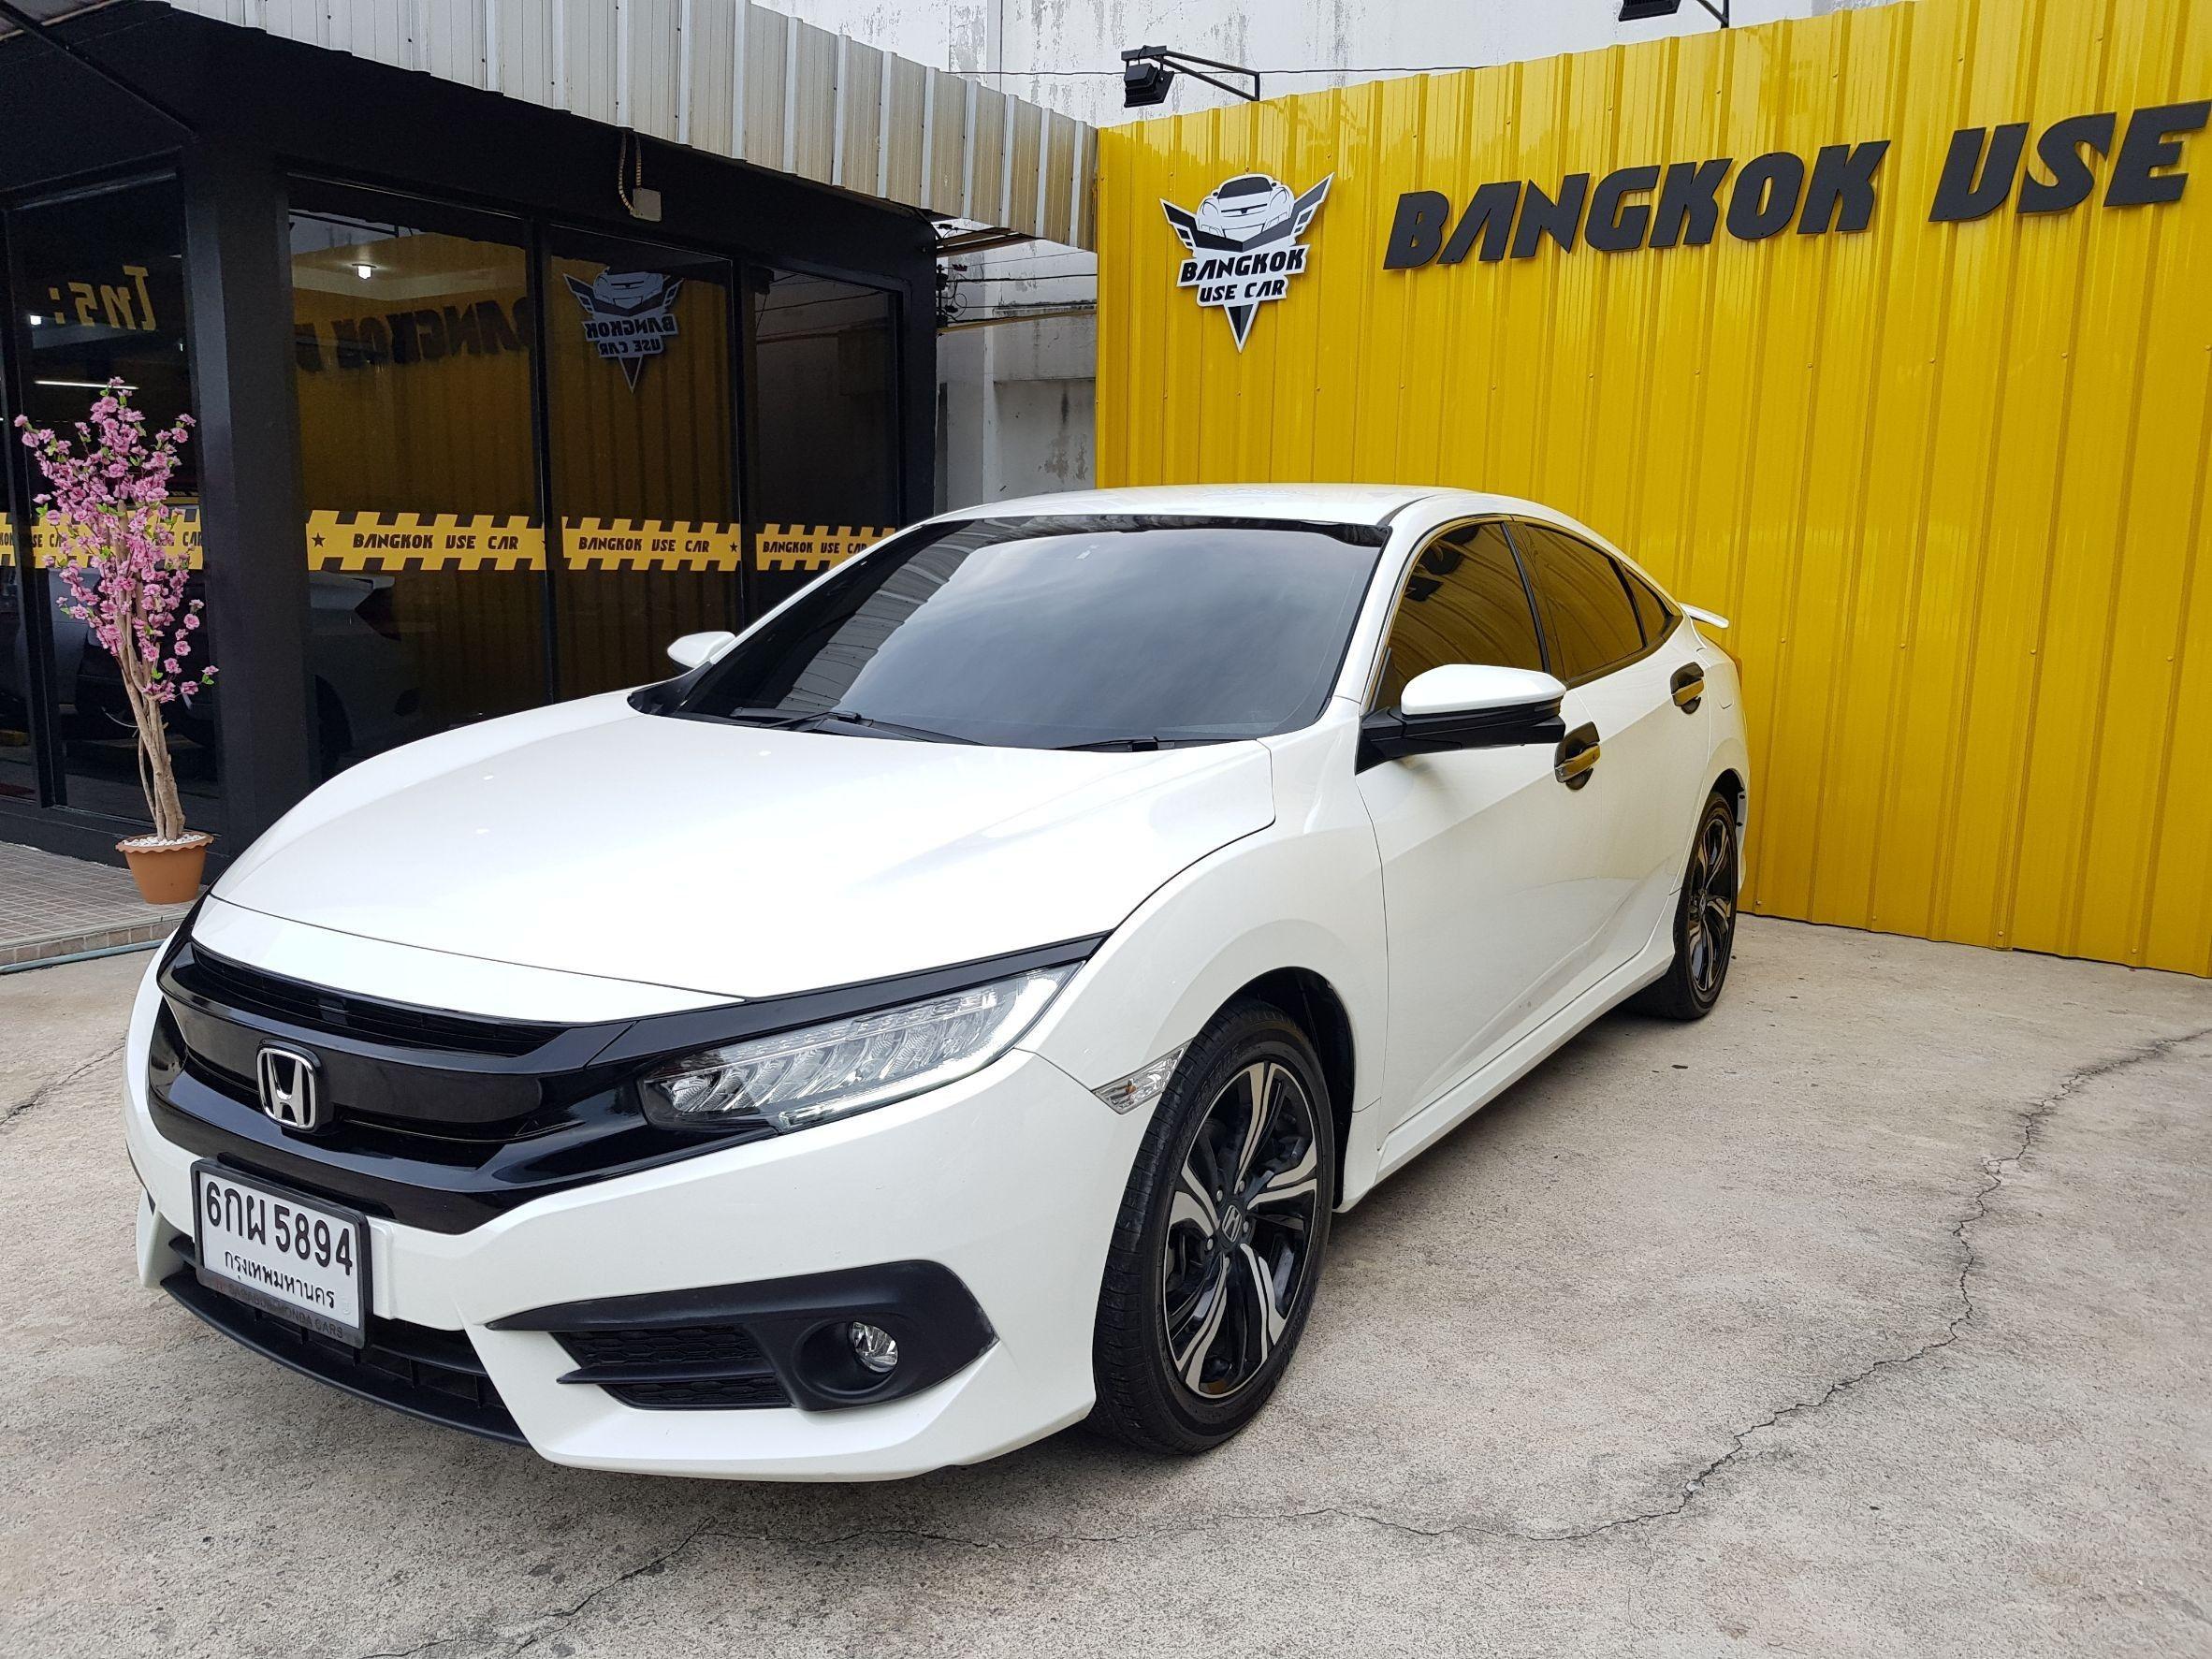 Honda New Civic Turbo RS 1.5 cc.🎈 🎗 สีขาว 🎗 🏆 ปี 2017